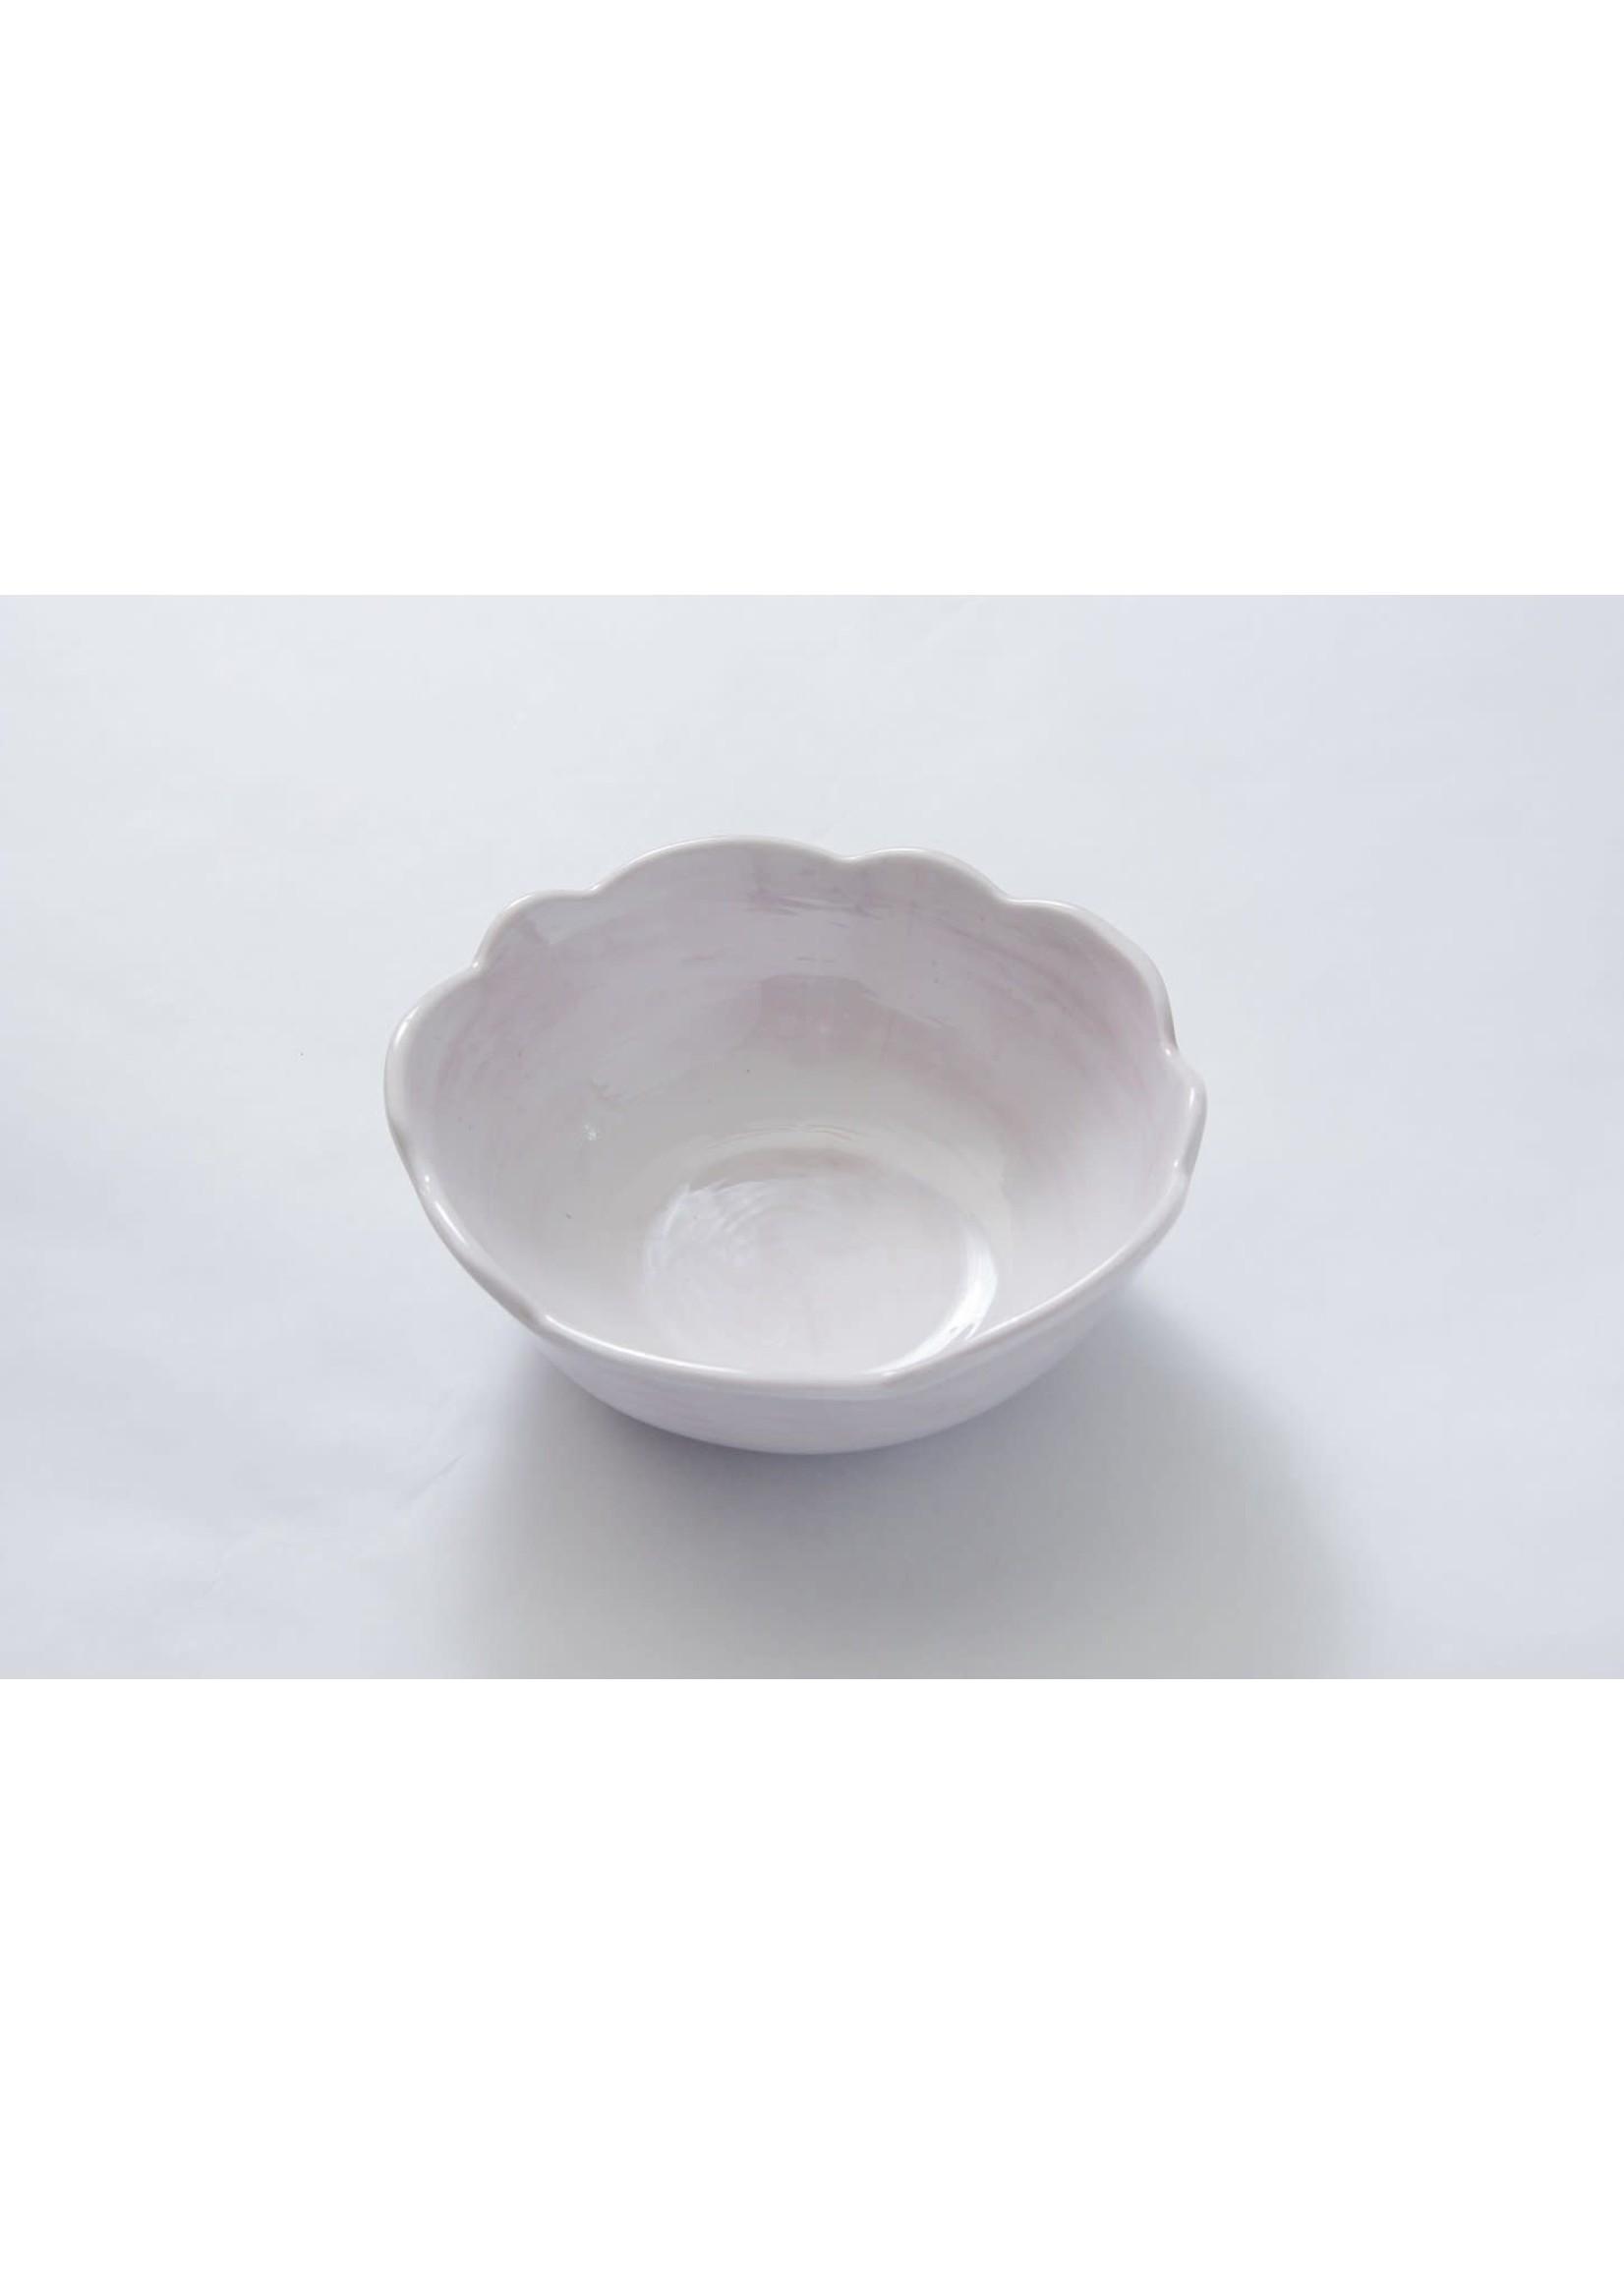 Relish Melamine - Scalloped Soup/Cereal Bowl - White